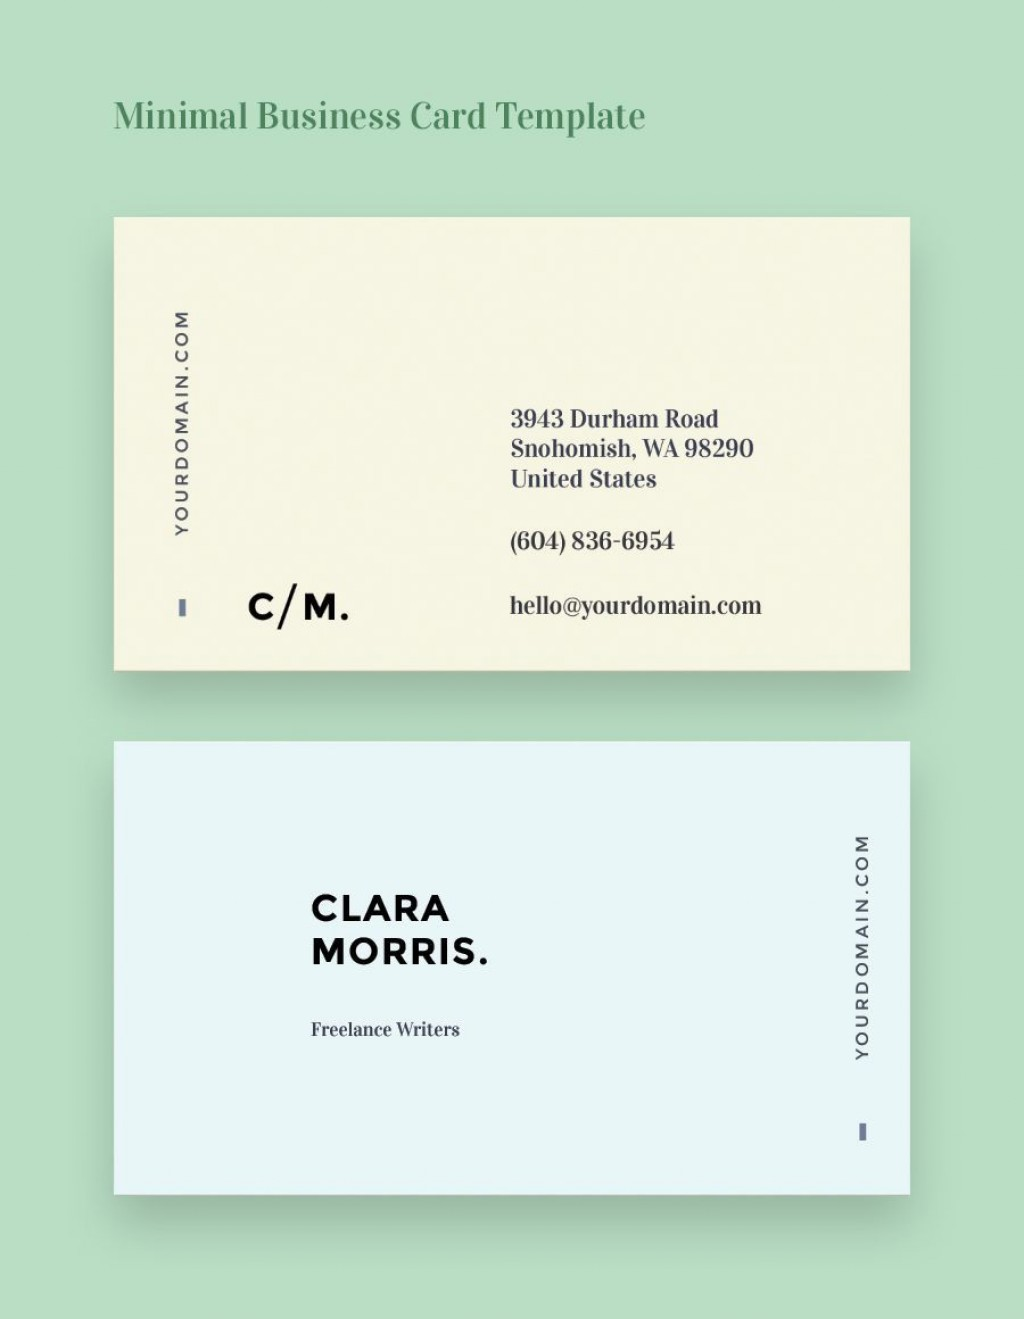 002 Unusual Minimal Busines Card Template Free Idea  Easy Simple DownloadLarge